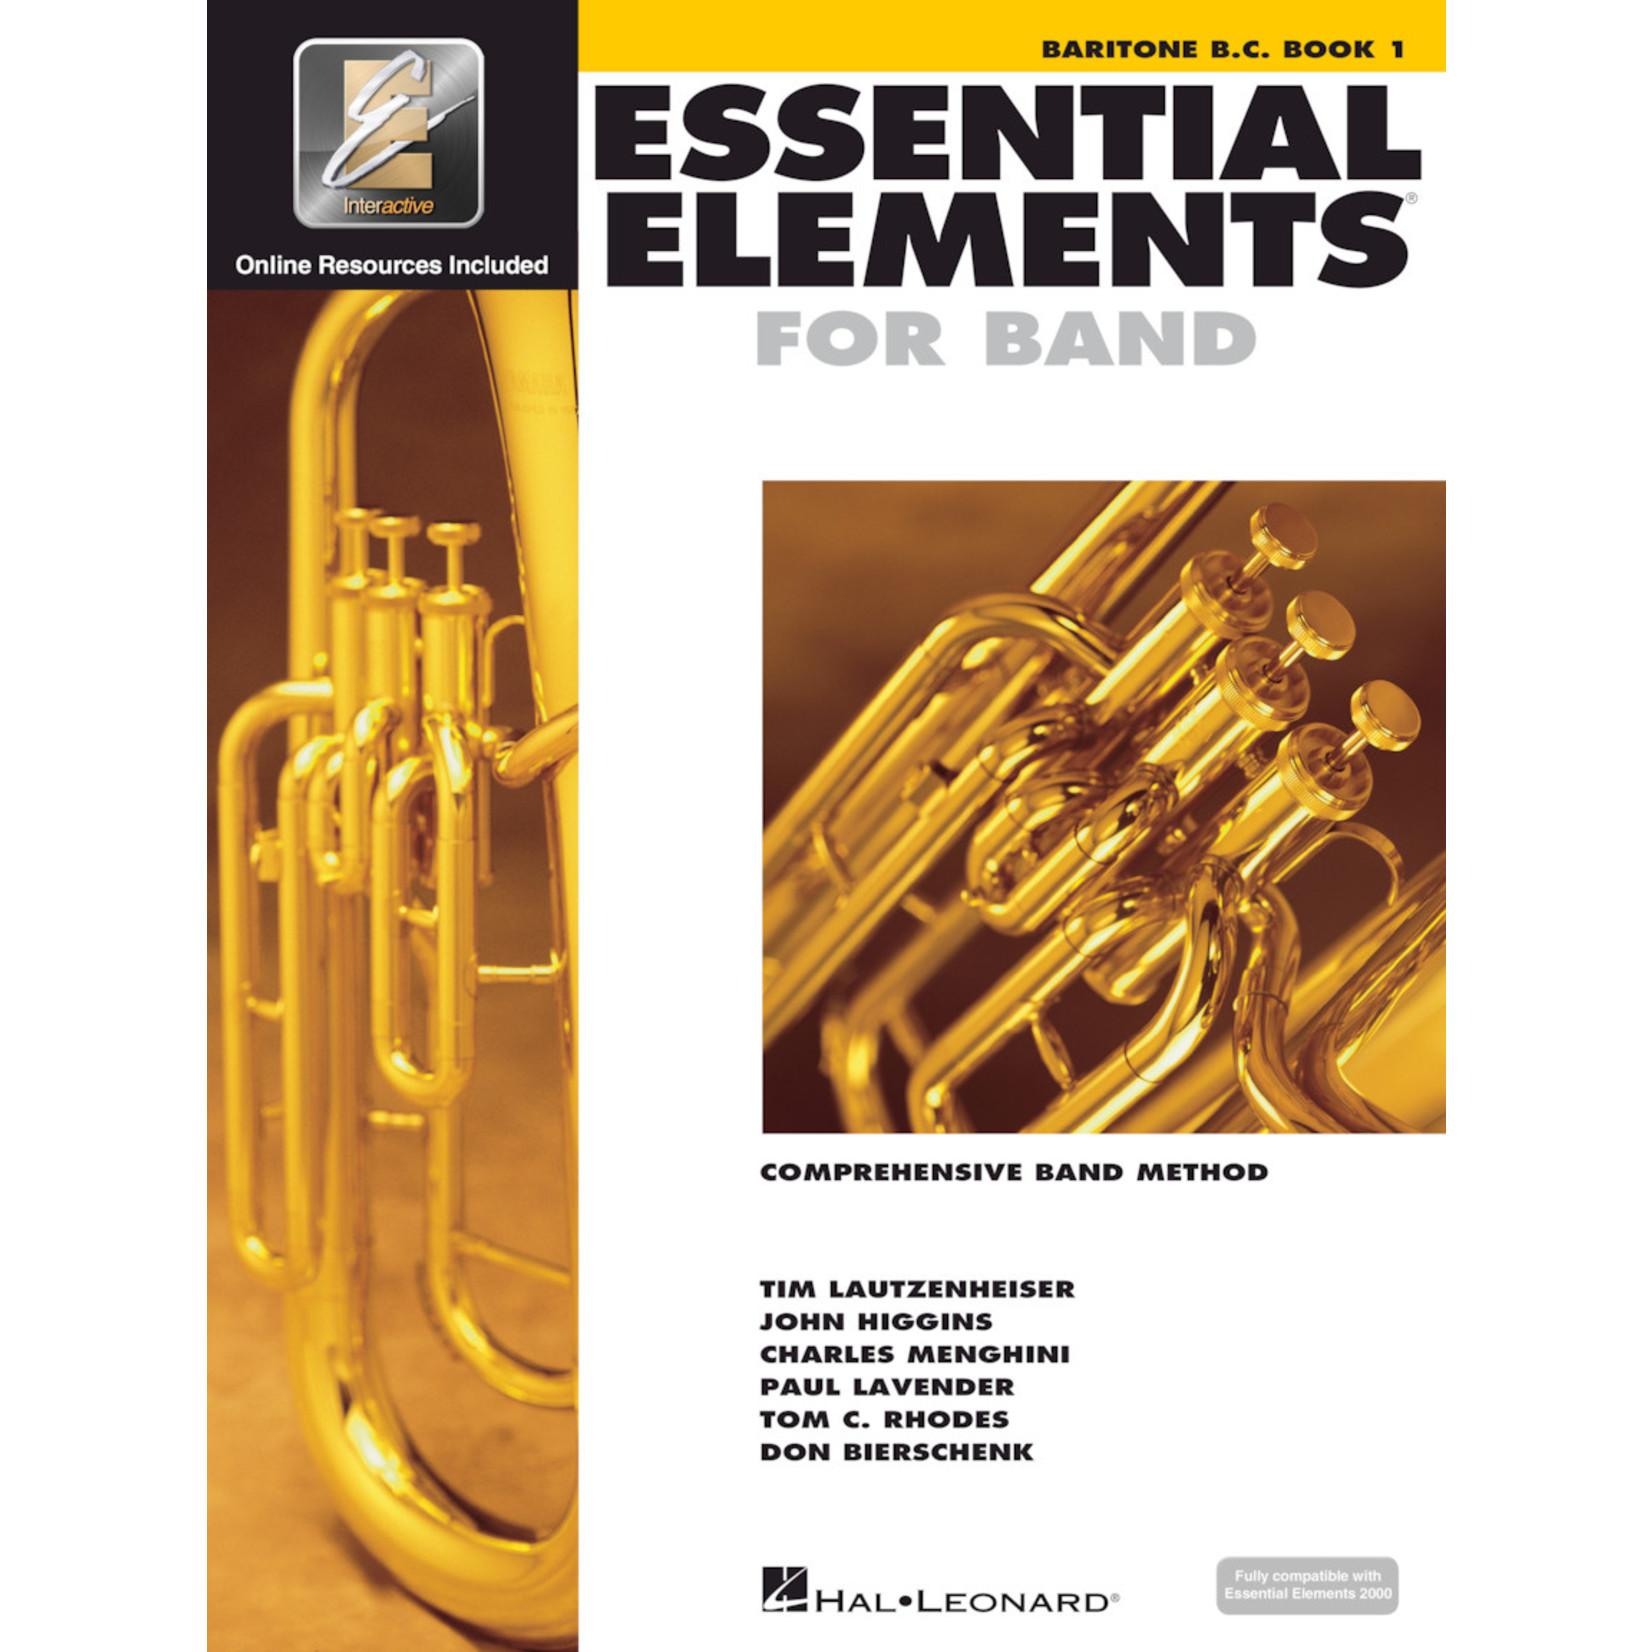 Hal Leonard Essential Elements for Band Baritone Bass Clef Book 1